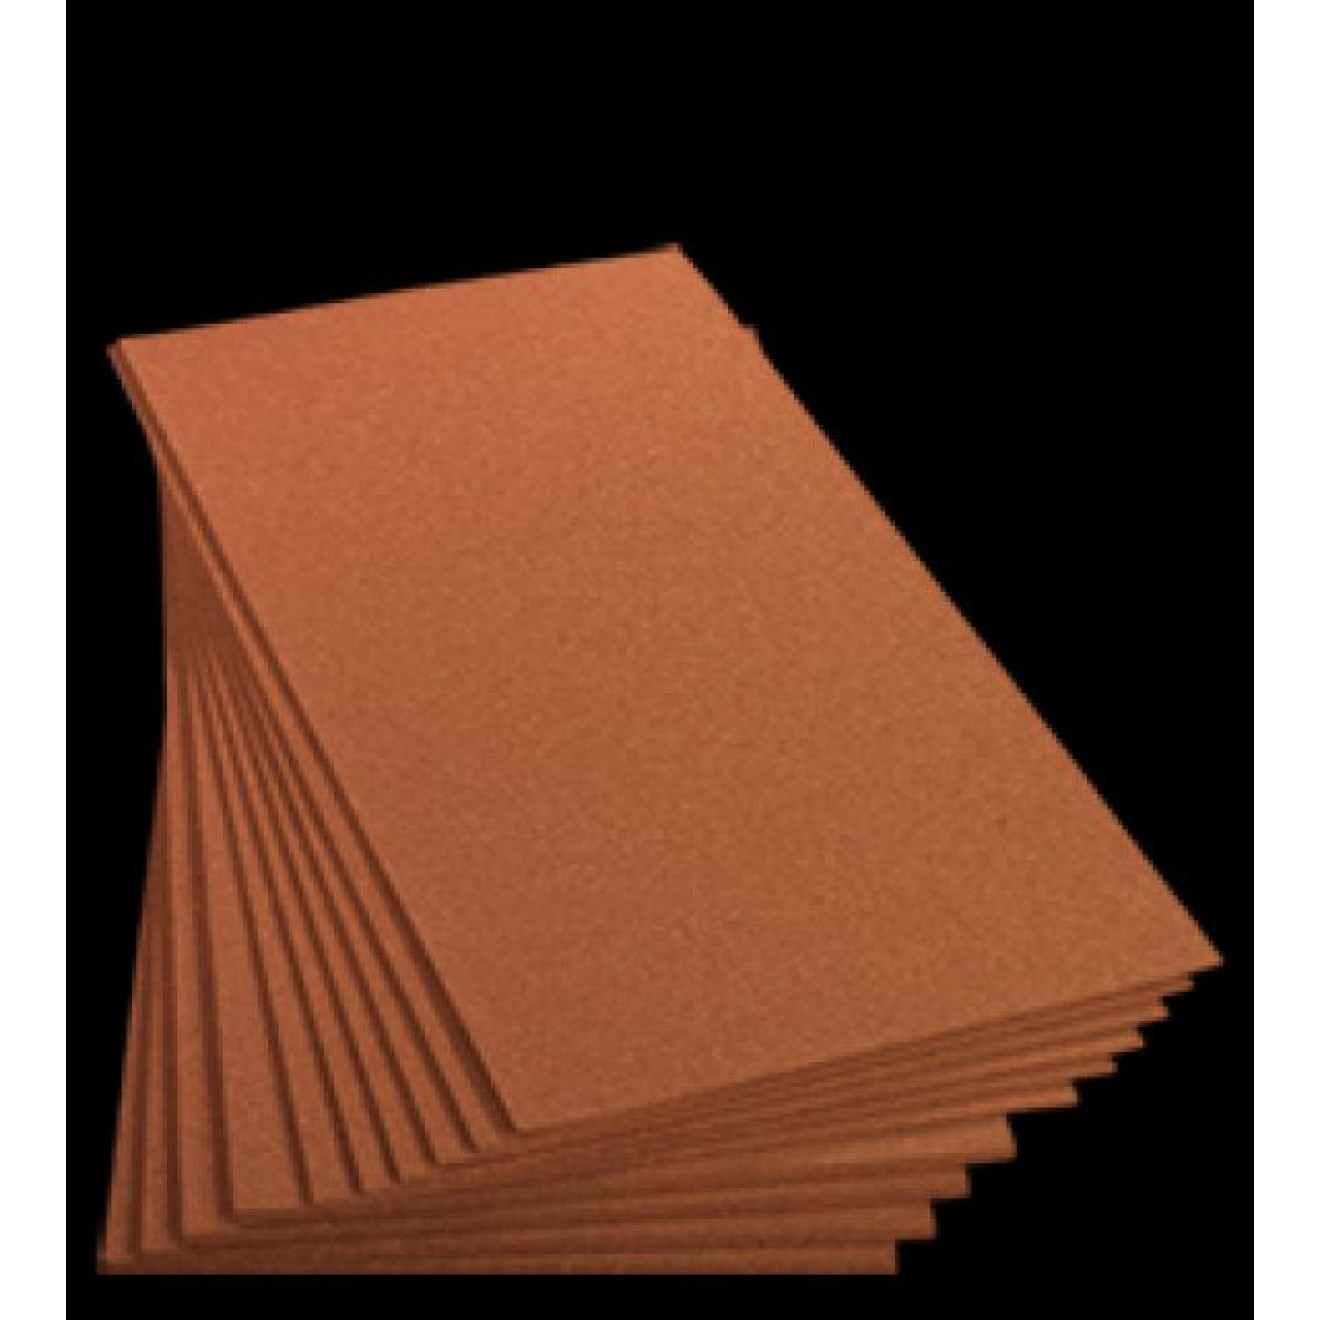 15qm cortica cork sheet 30 platten je 0 5m x 1m st rke 10mm. Black Bedroom Furniture Sets. Home Design Ideas